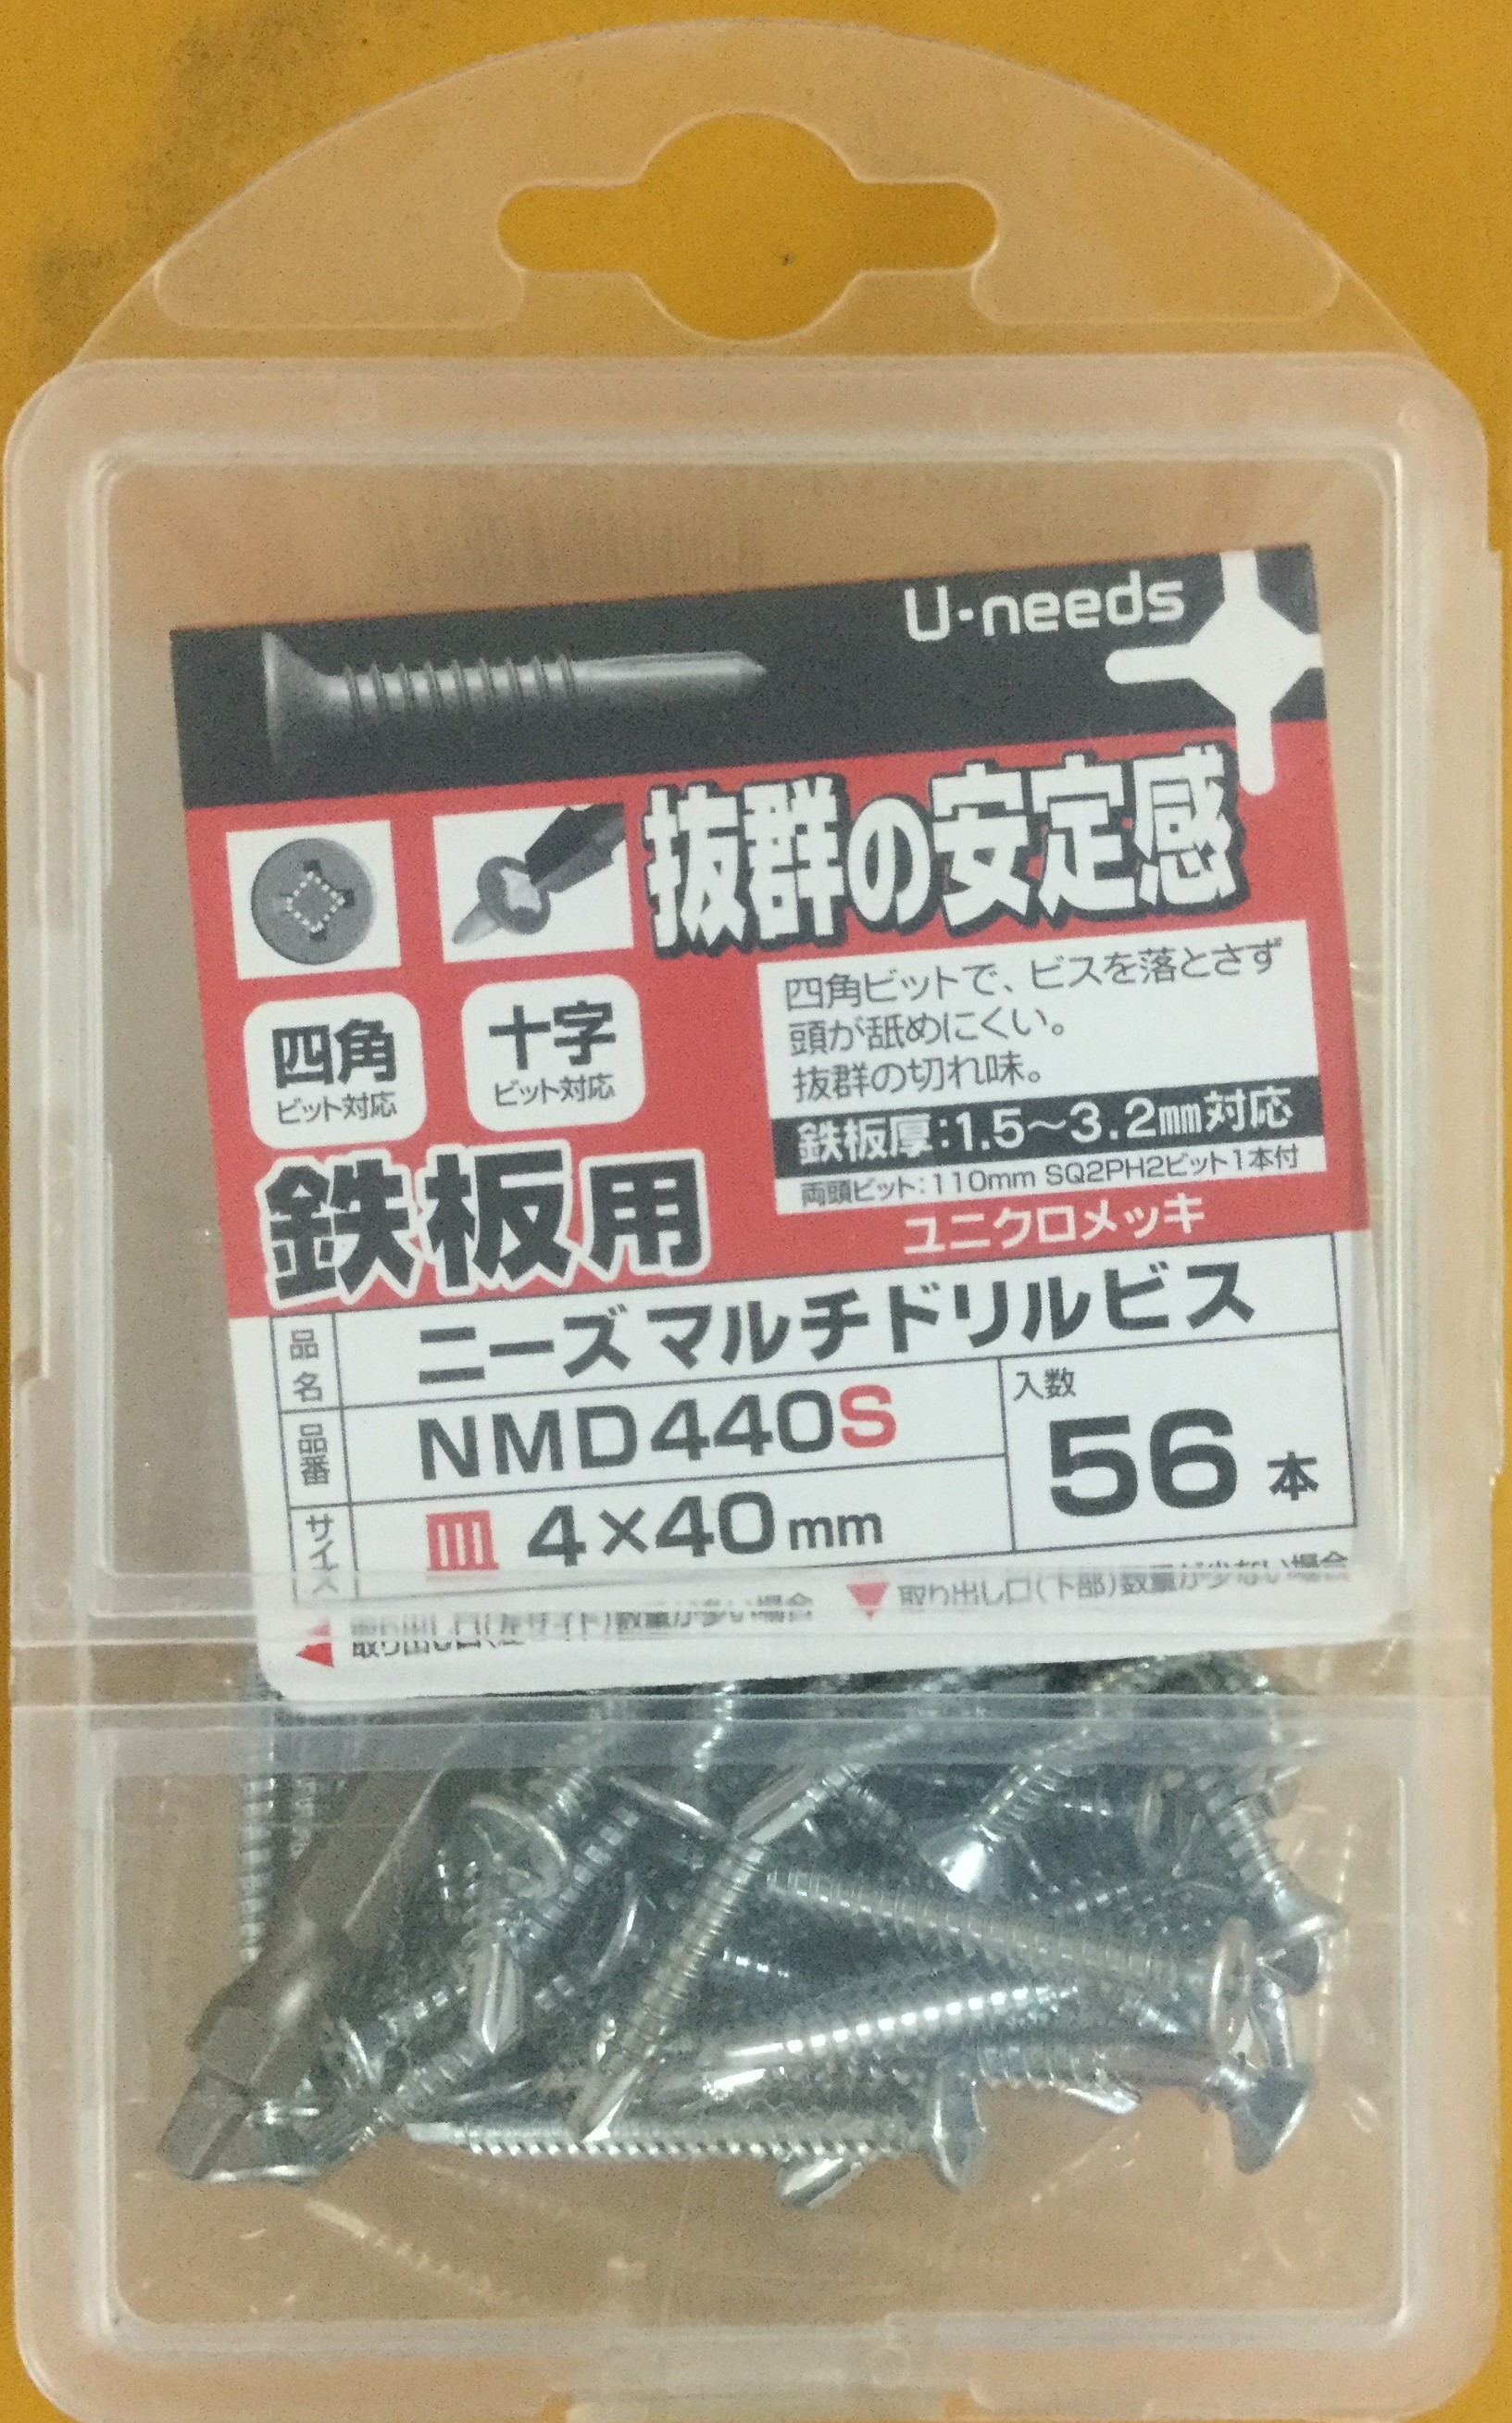 1.6mm~3.2mmまでの鉄板に 下穴なしで打ち込めるマルチドリルビス マルチドリルビスNMD440S プロ用 高級 お得 贈答 ニーズ2020 ユ 鉄板ビス